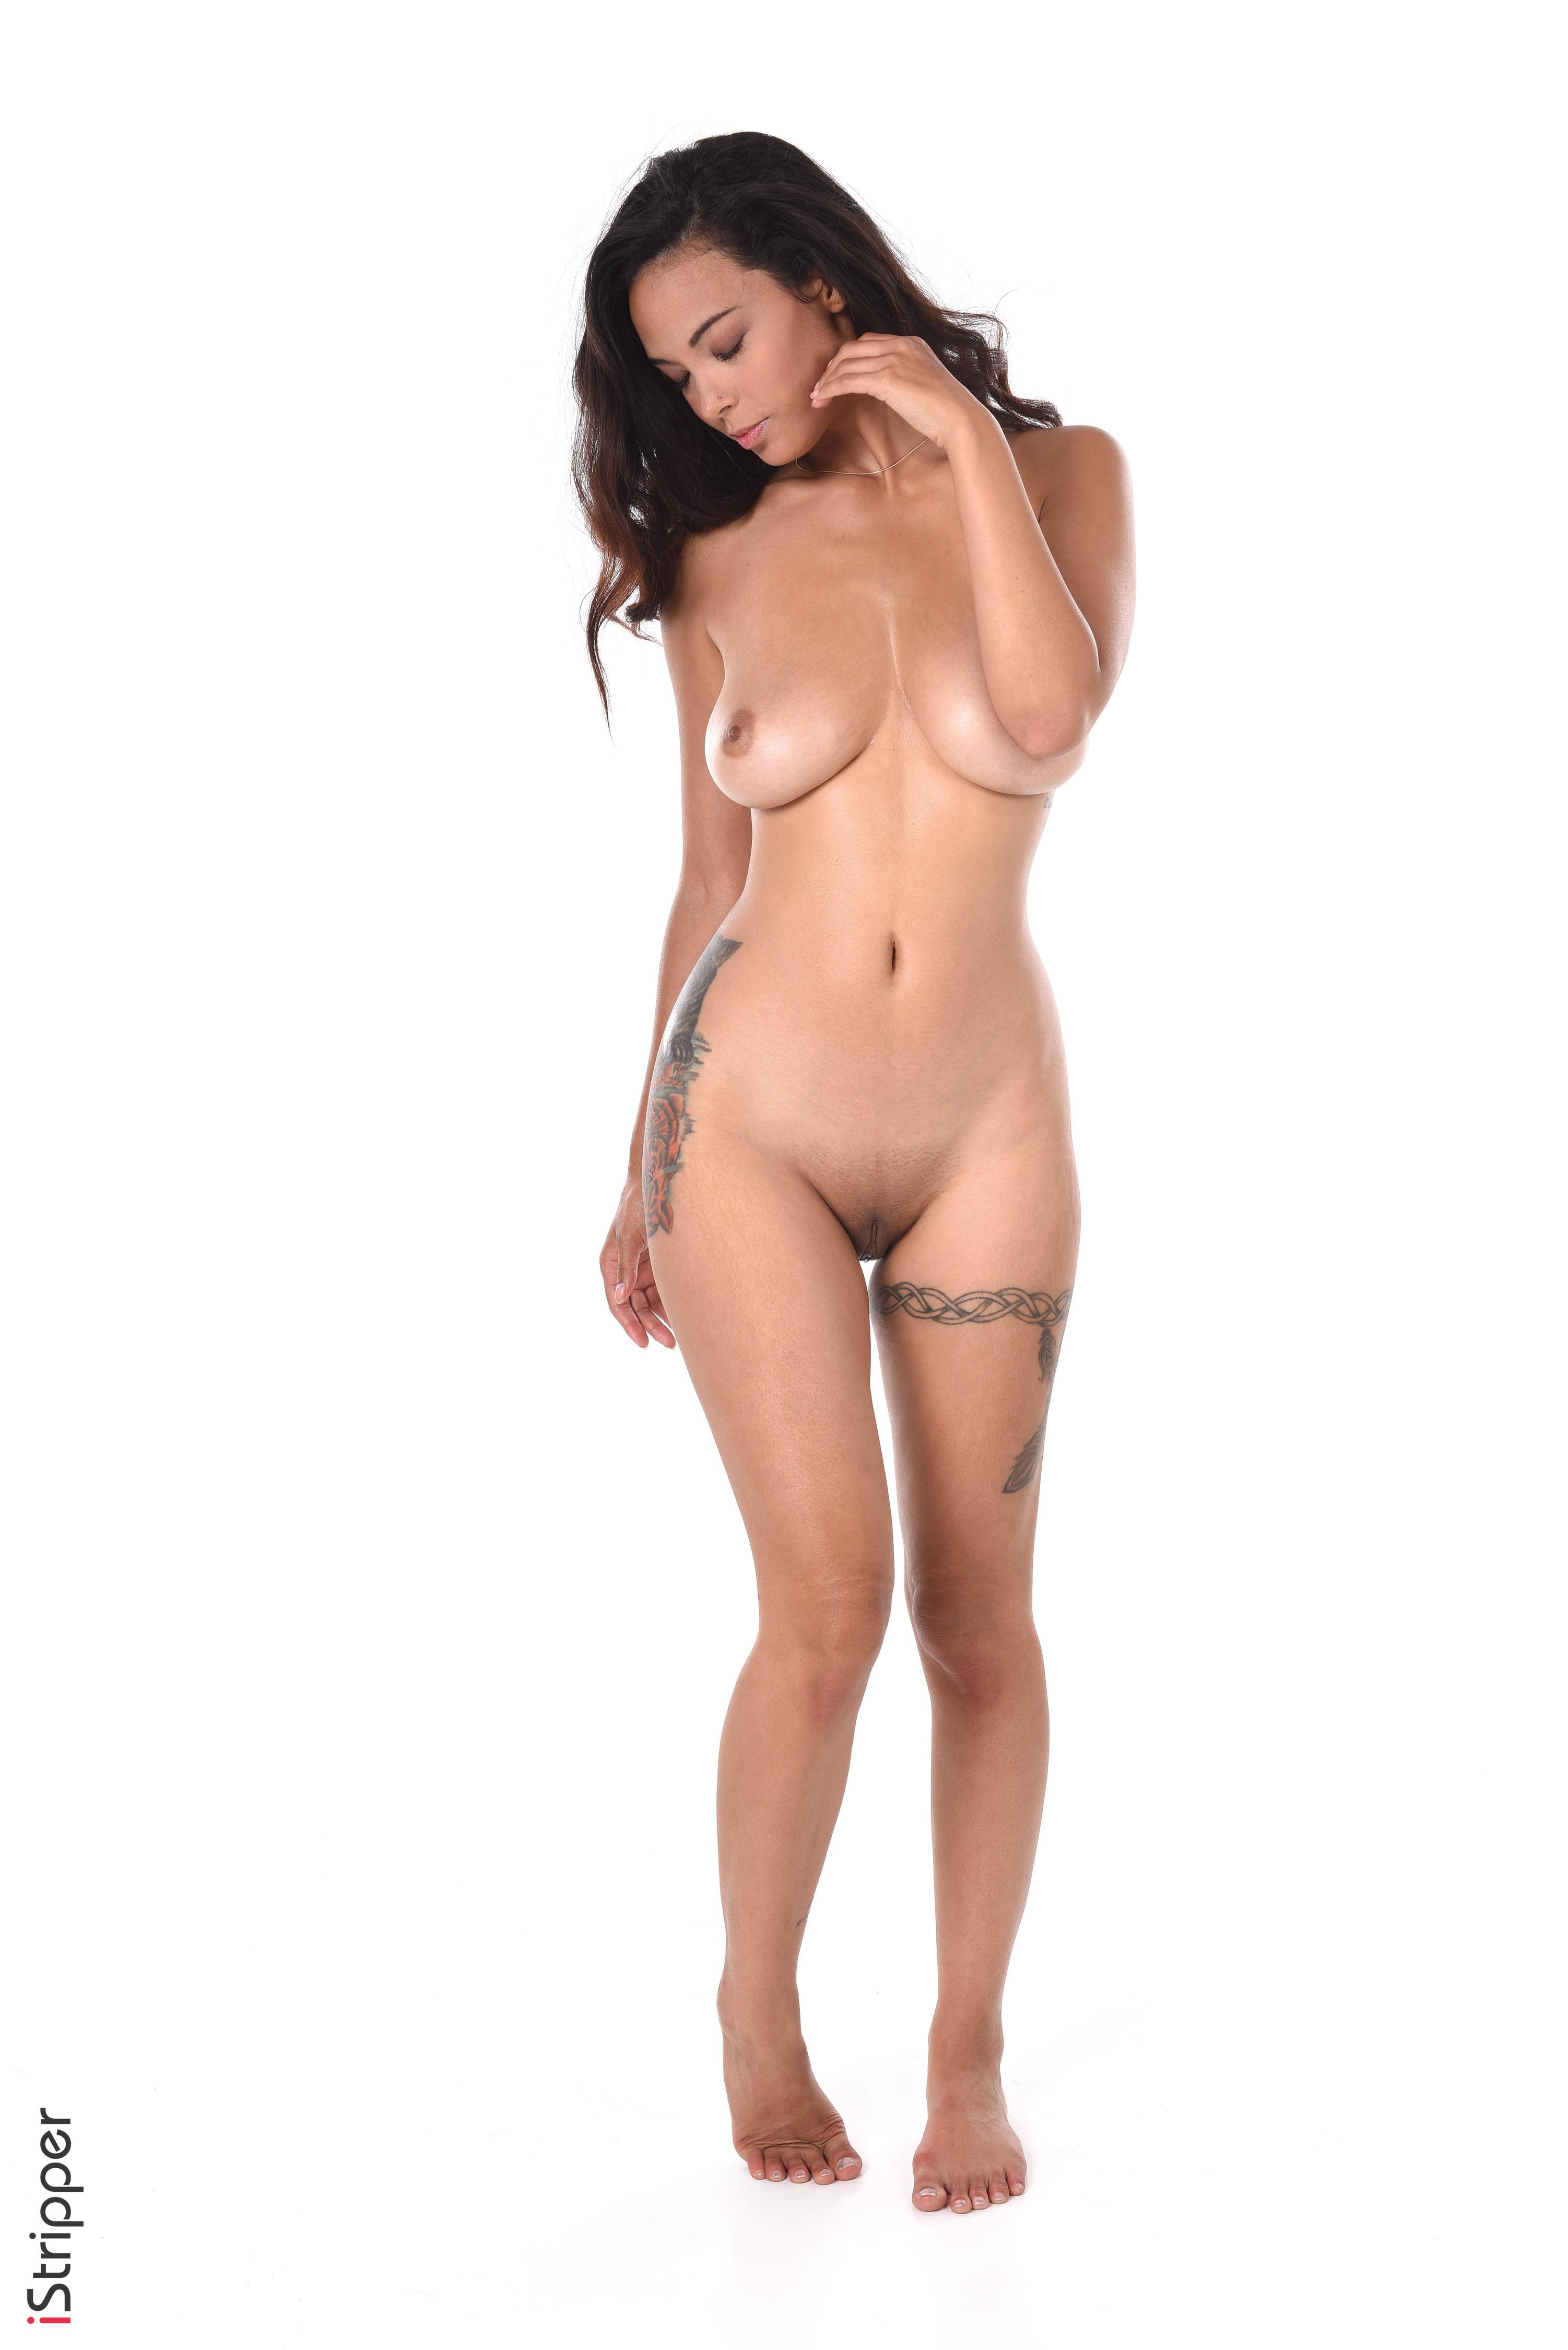 sexy boobs wall